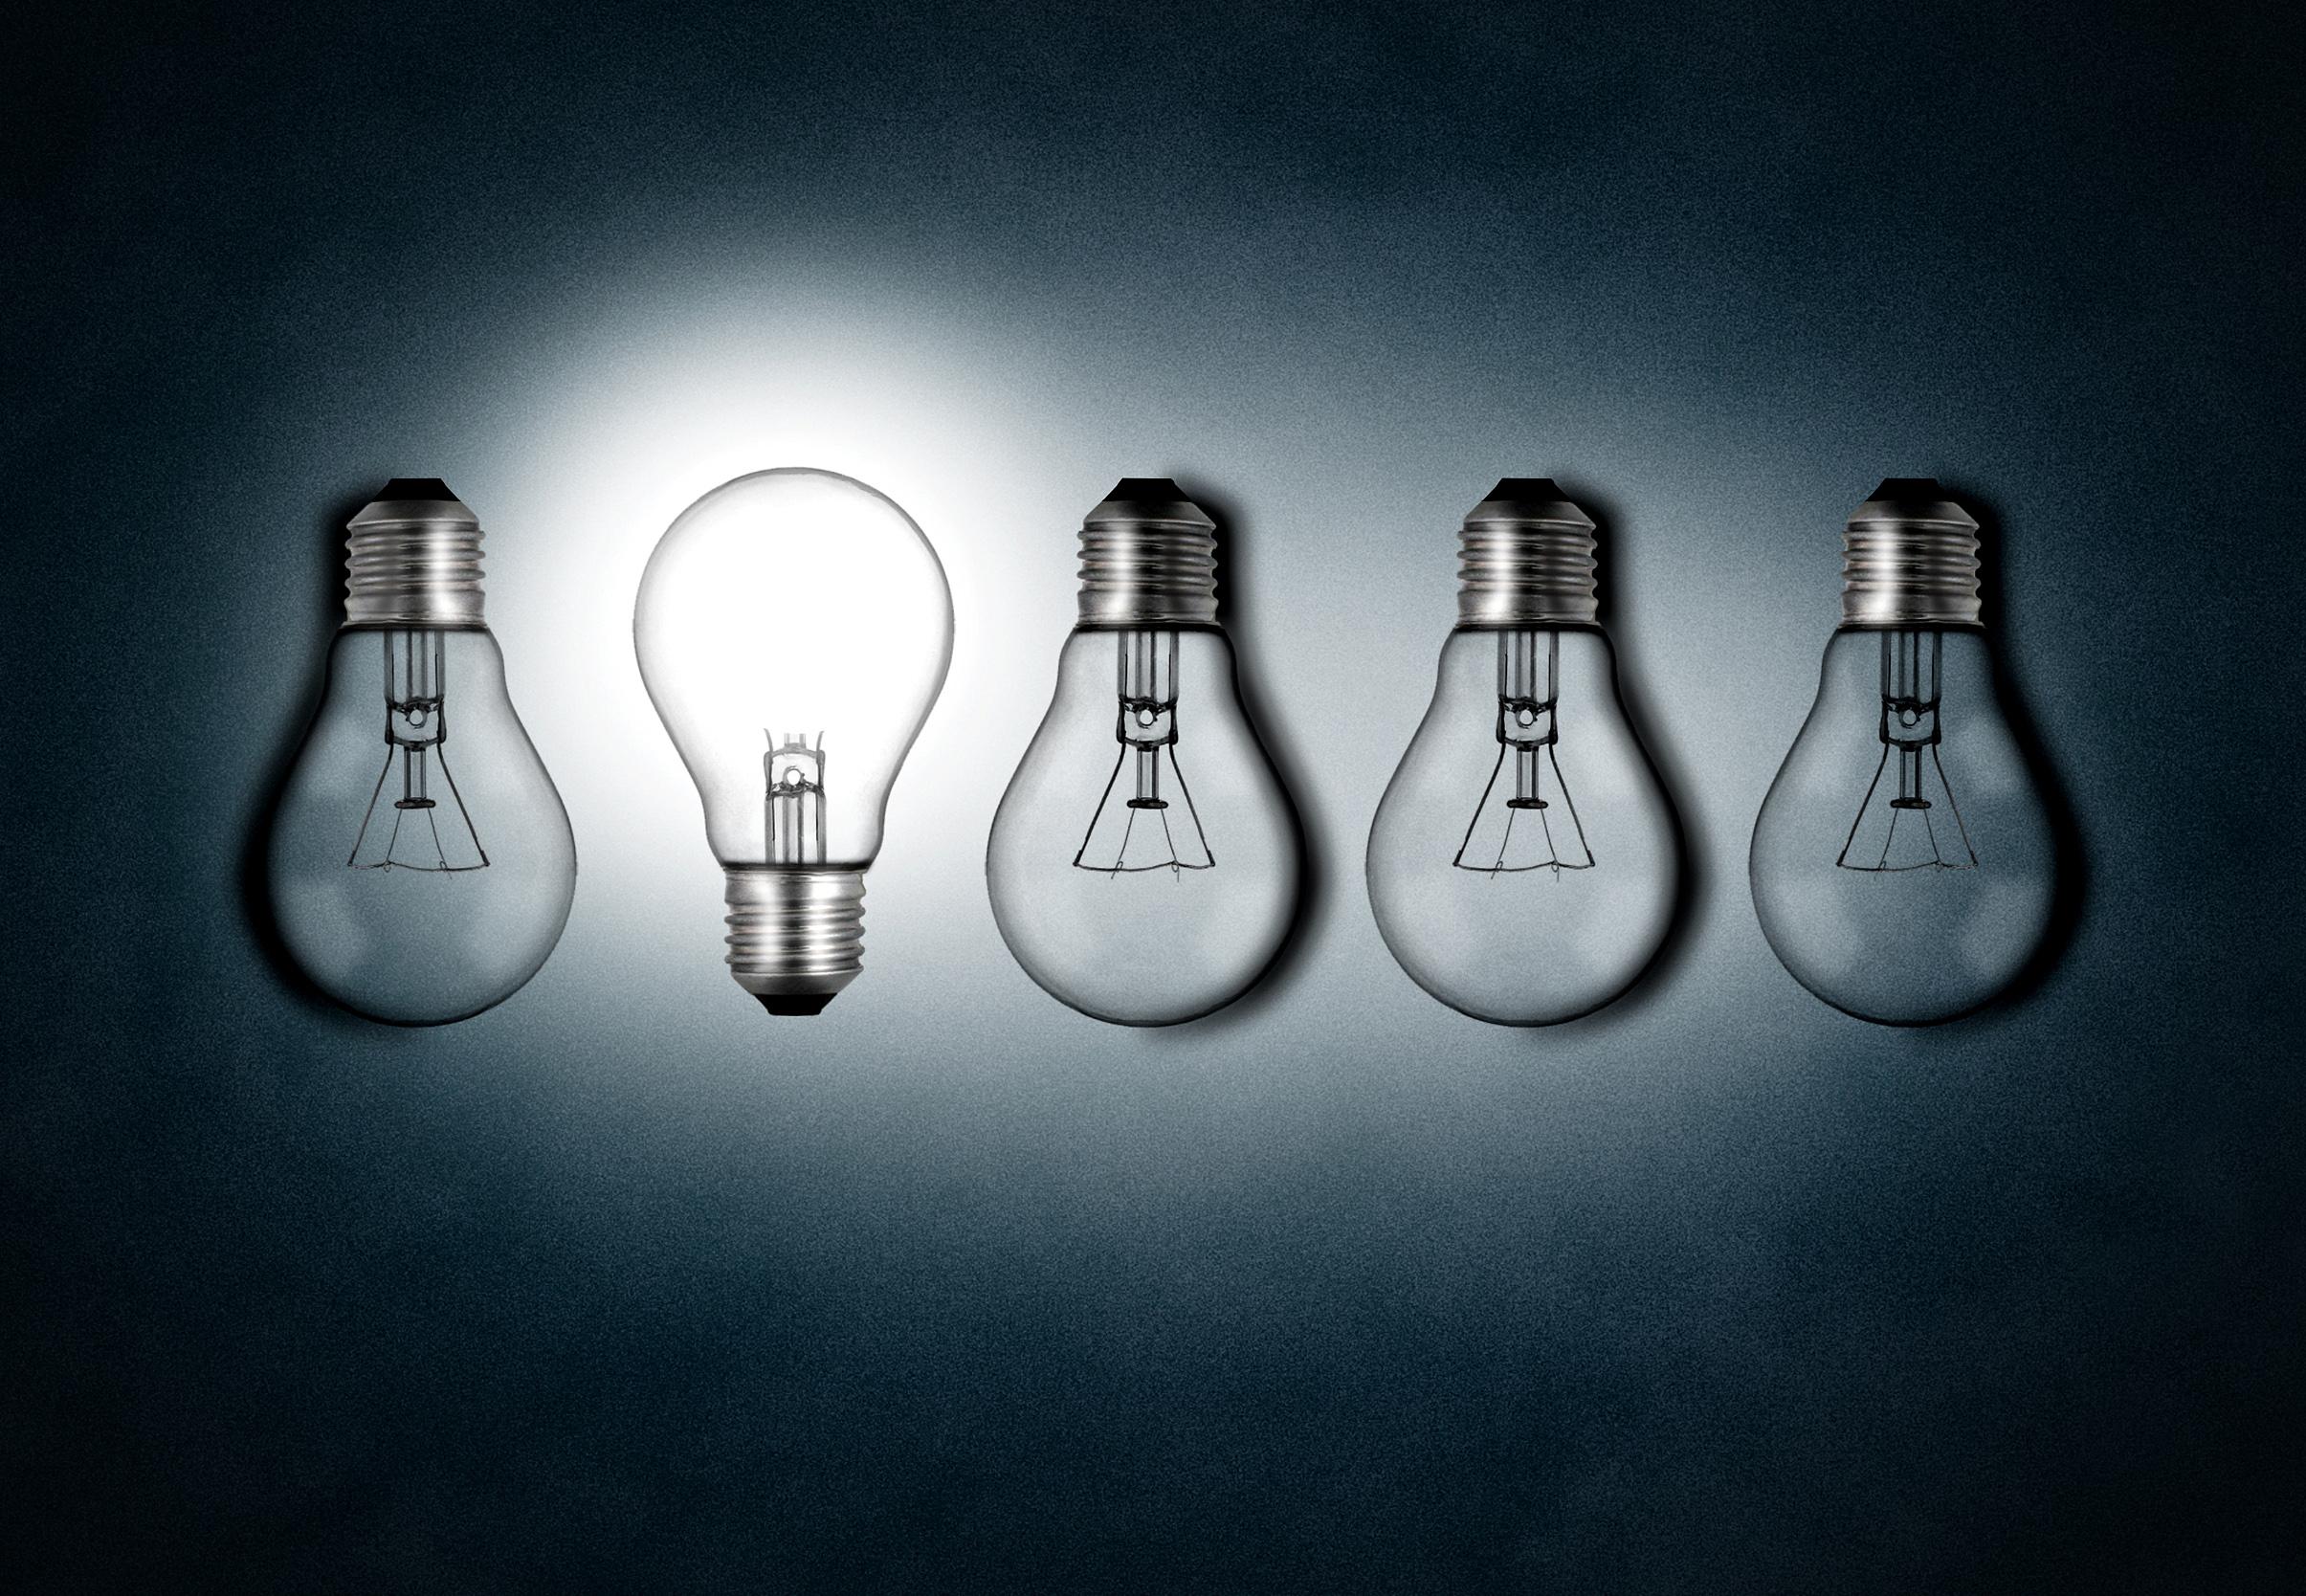 Illuminated lightbulb amid dim bulbs, Leadership, Objects, Object, New, HQ Photo